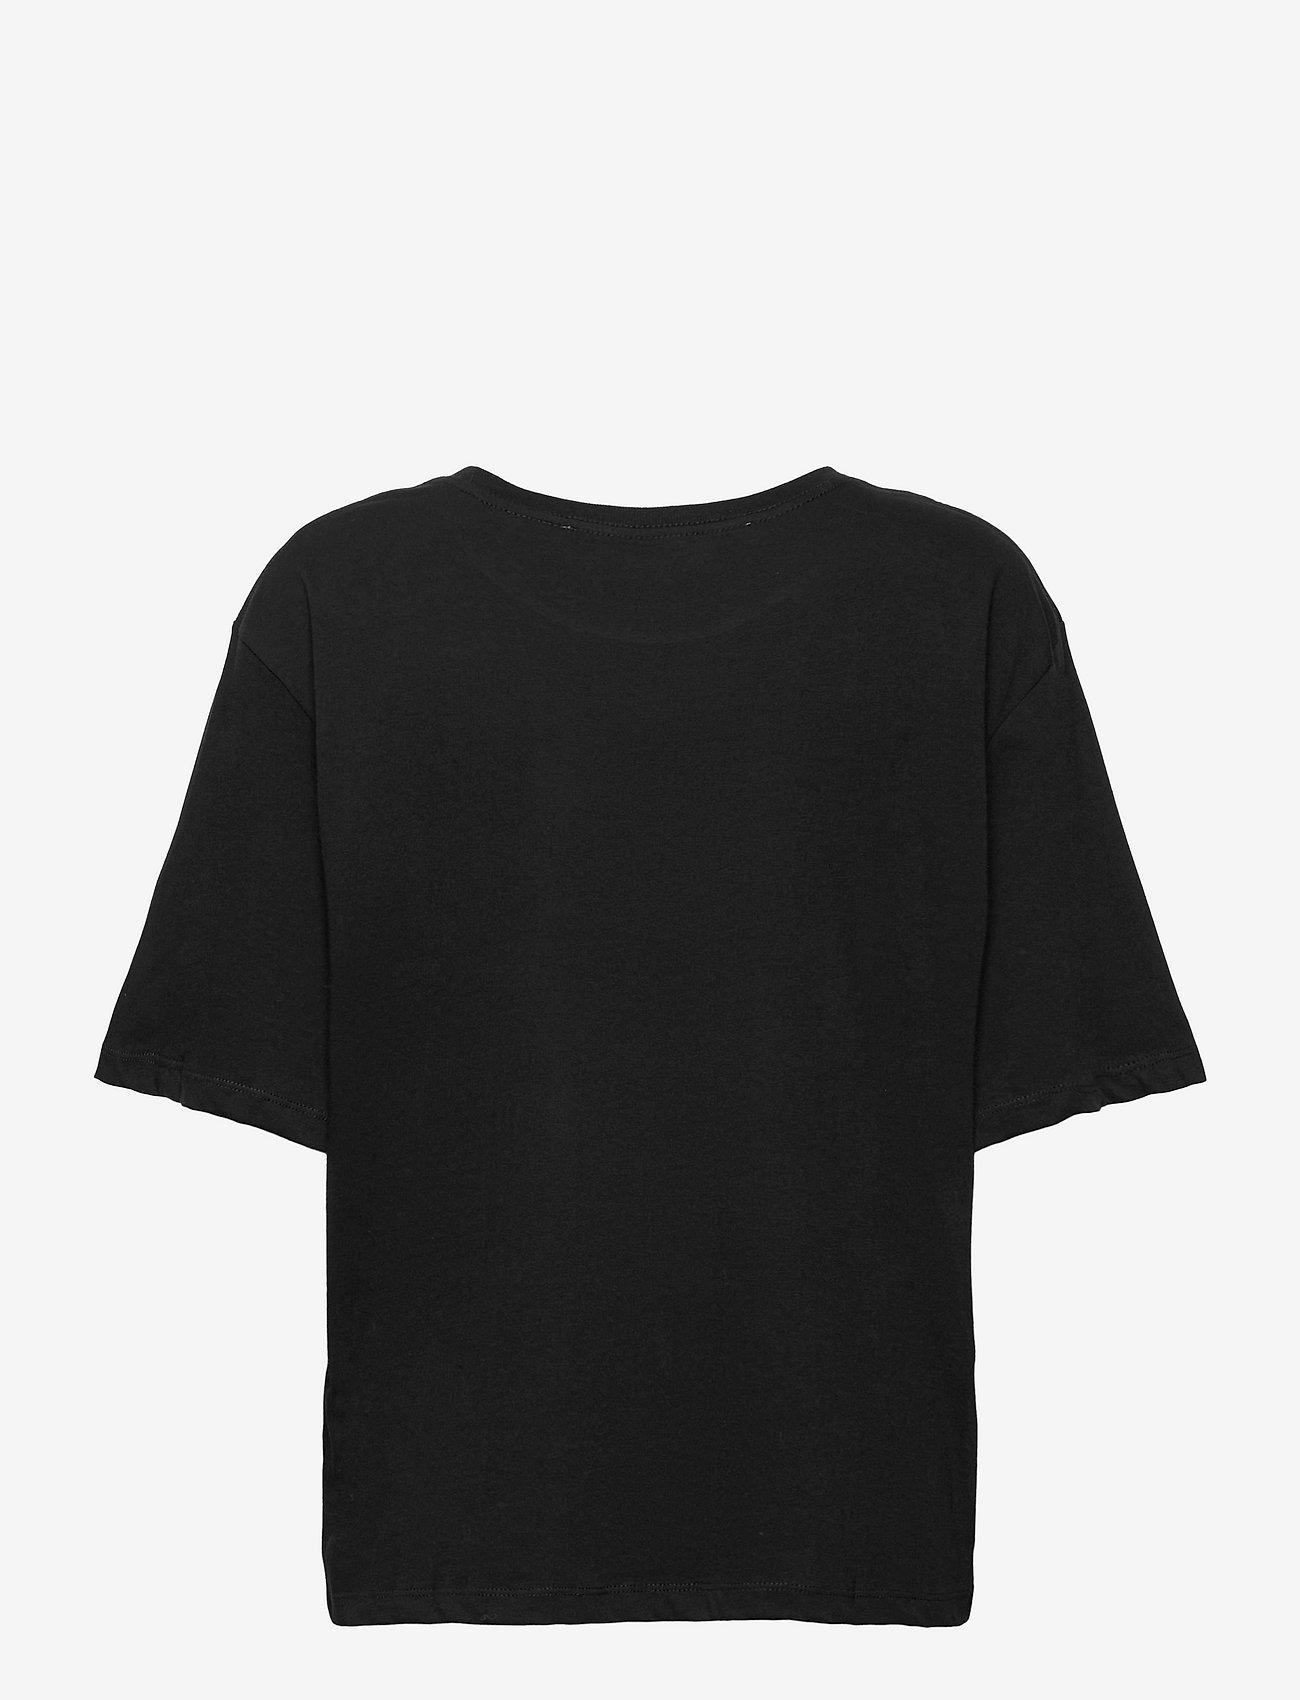 ROTATE Birger Christensen - Aster Tee - t-shirts - black - 1